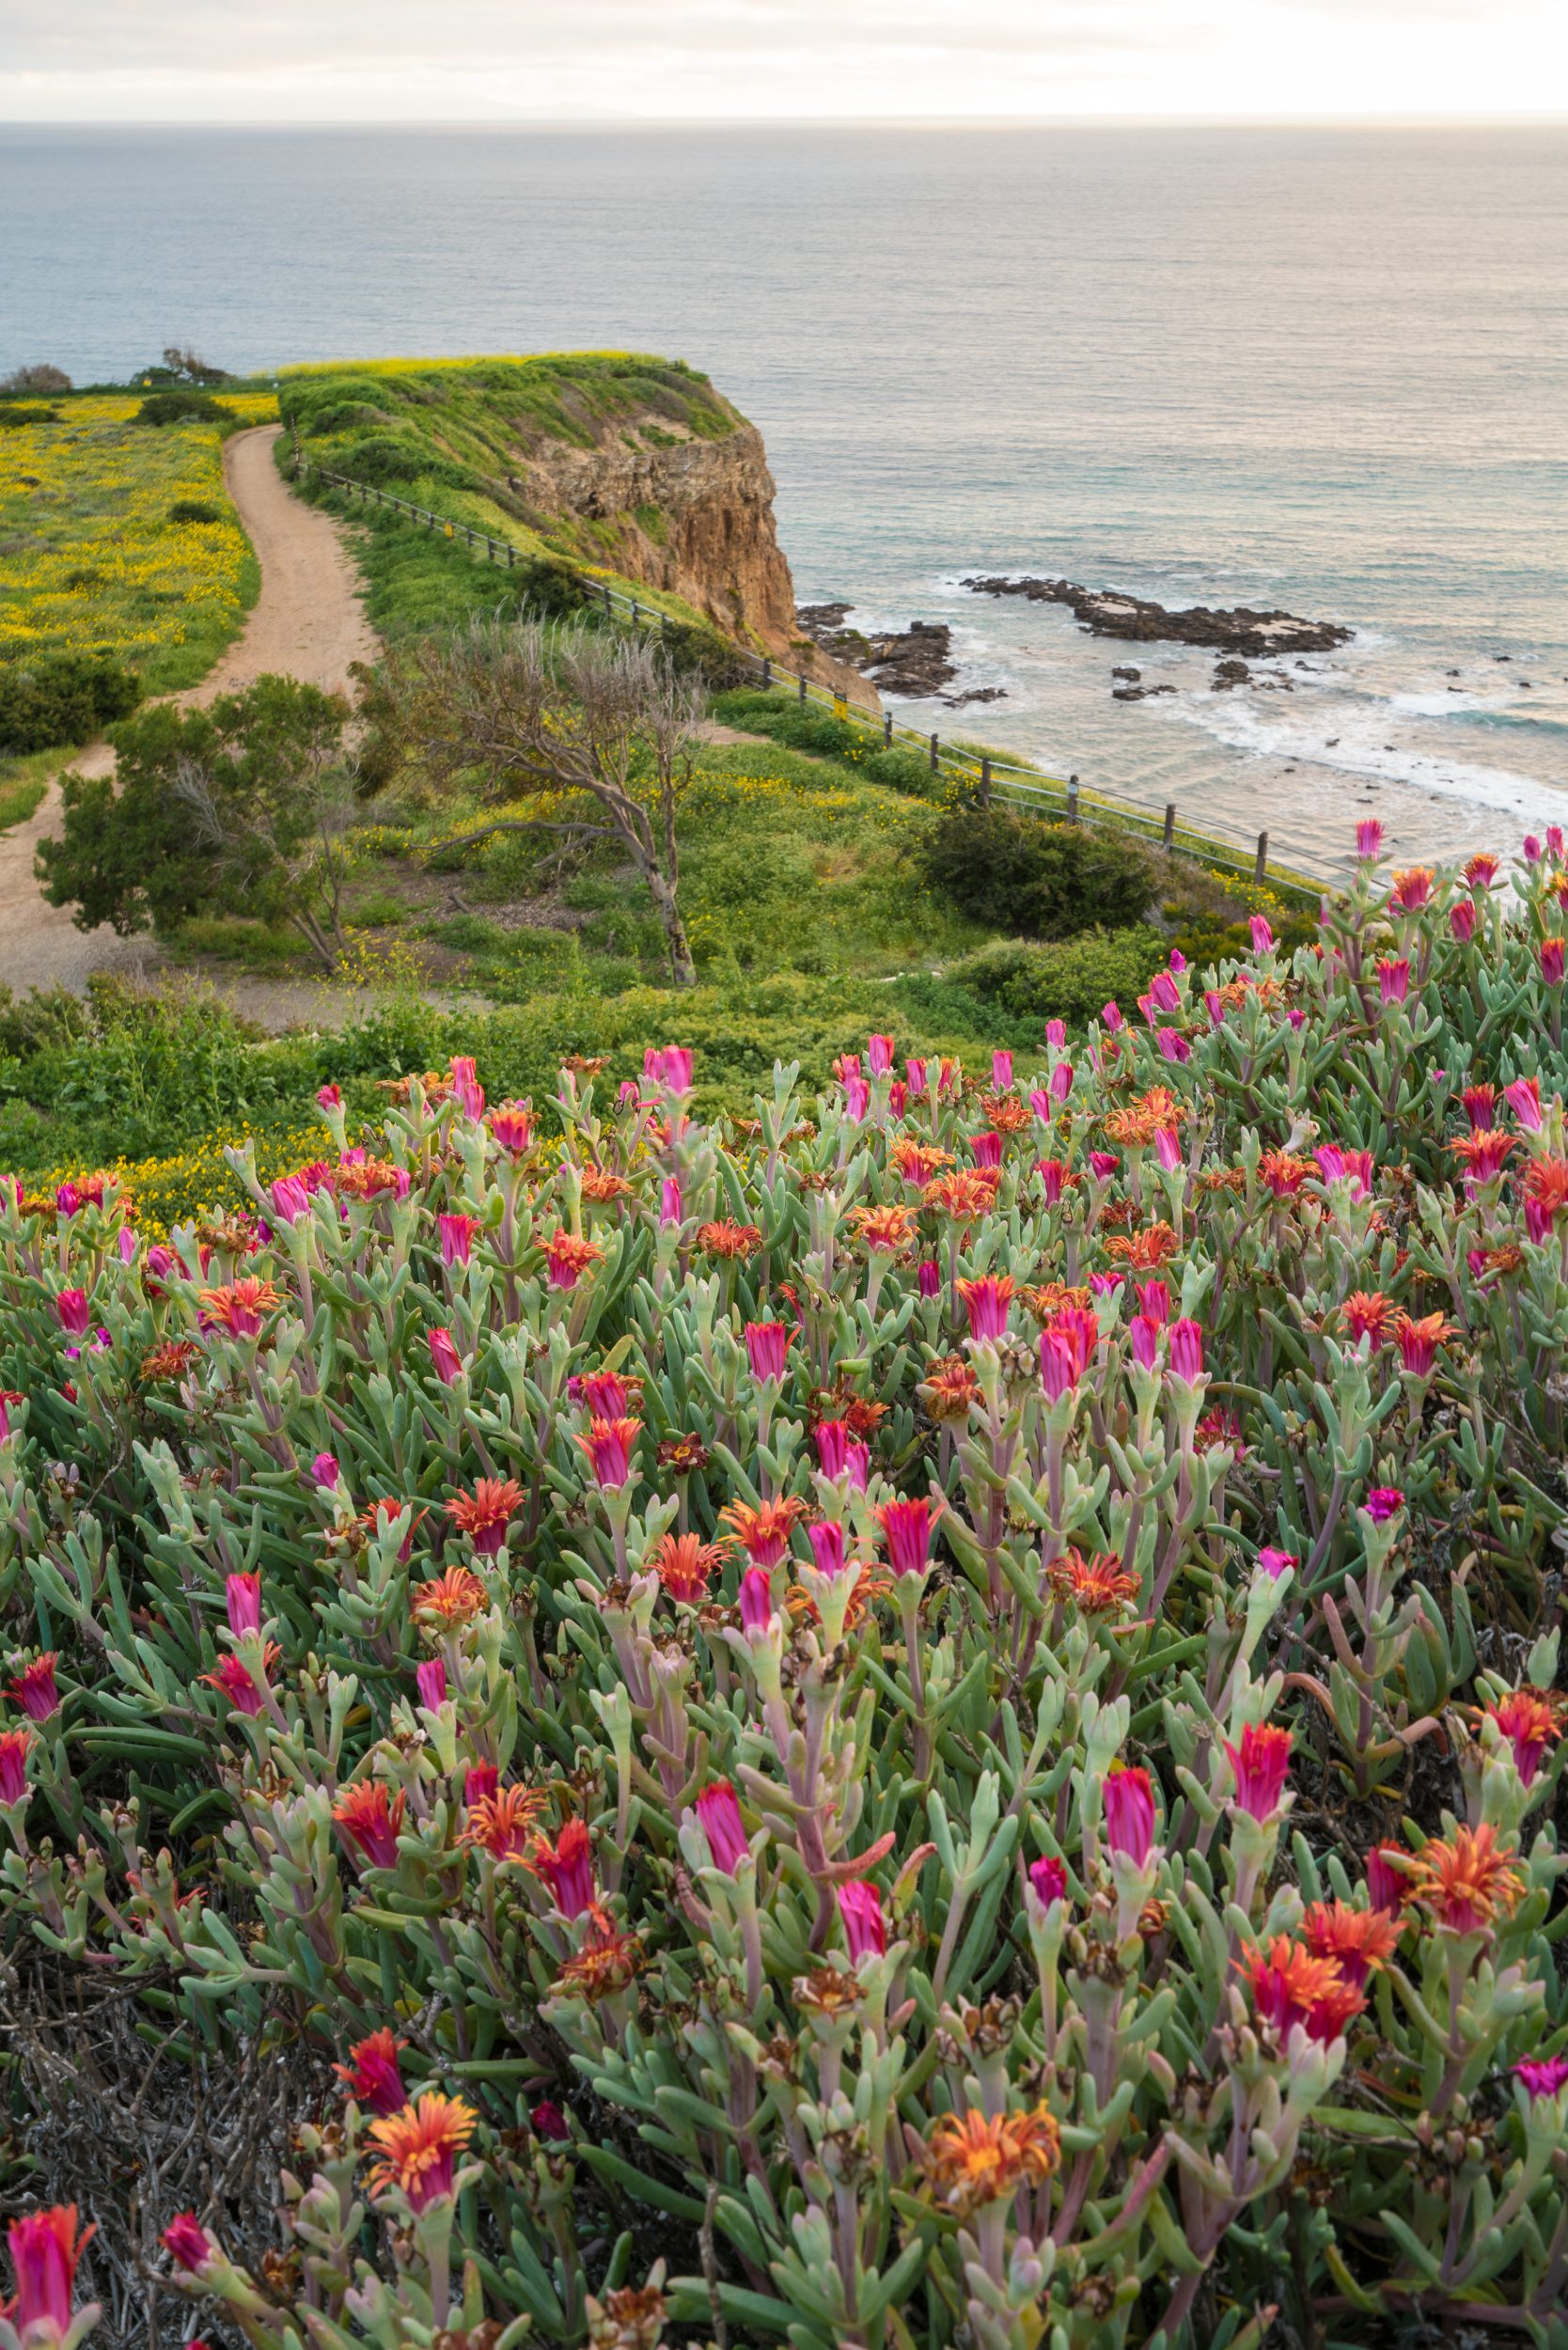 Abalone Cove Shoreline Park, California 2017